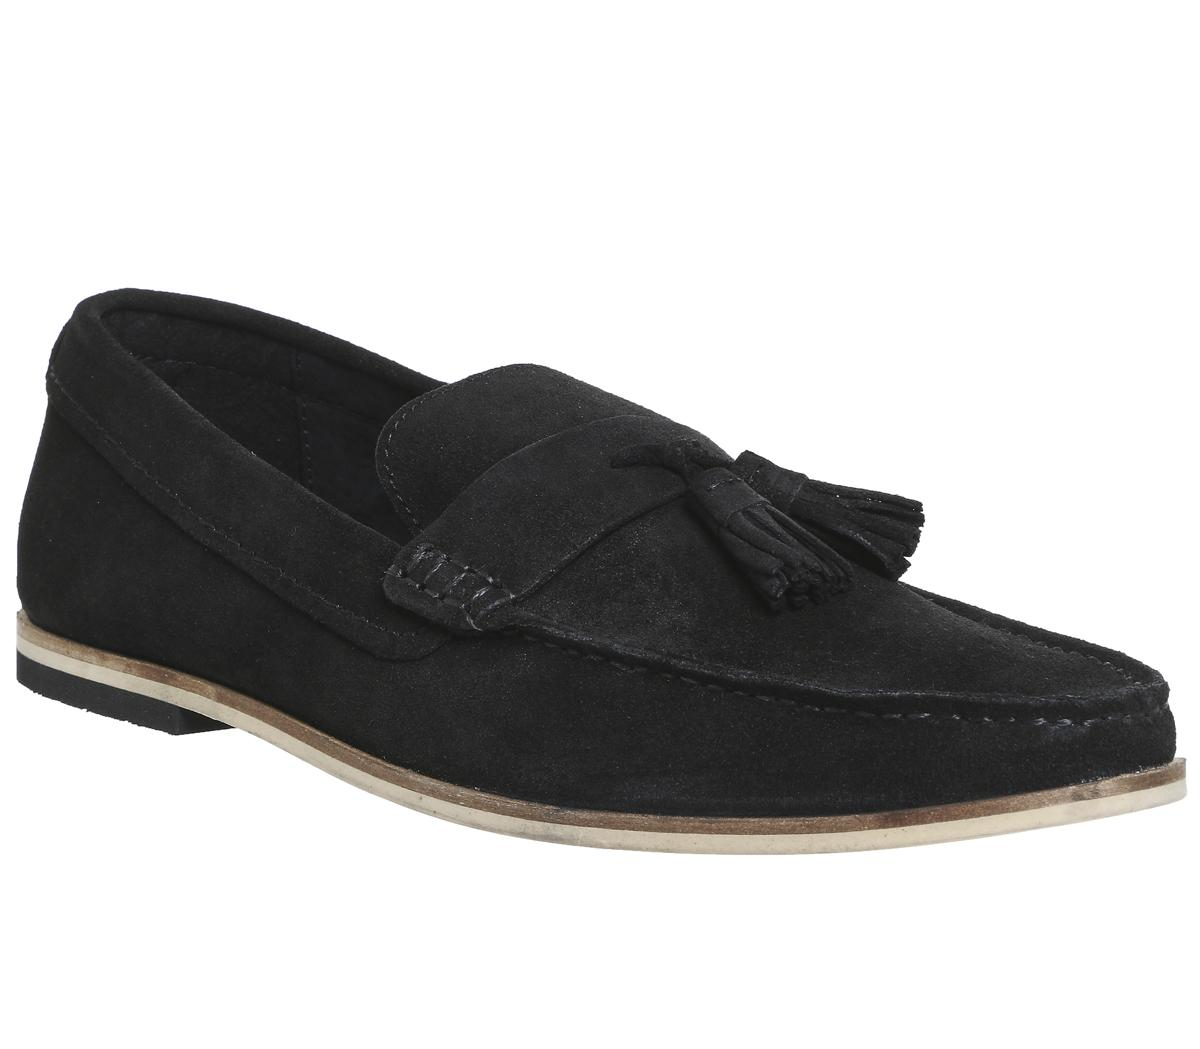 Favour Tassel Loafers